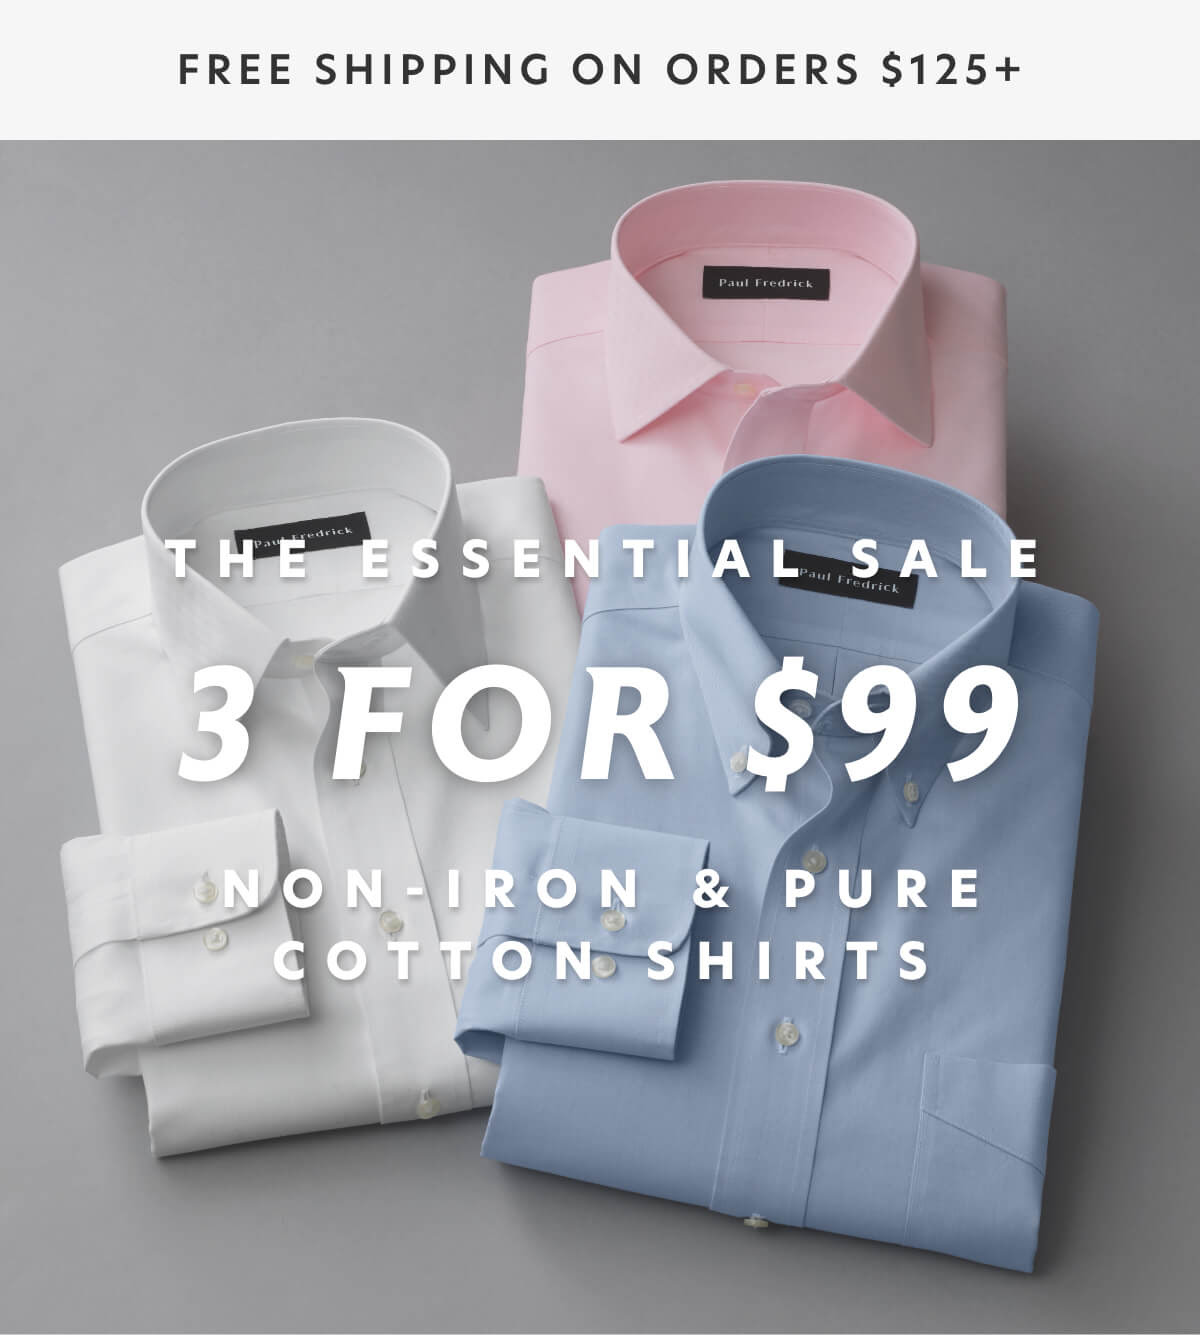 Paul Fredrick: 3 for $99 Essential Shirts